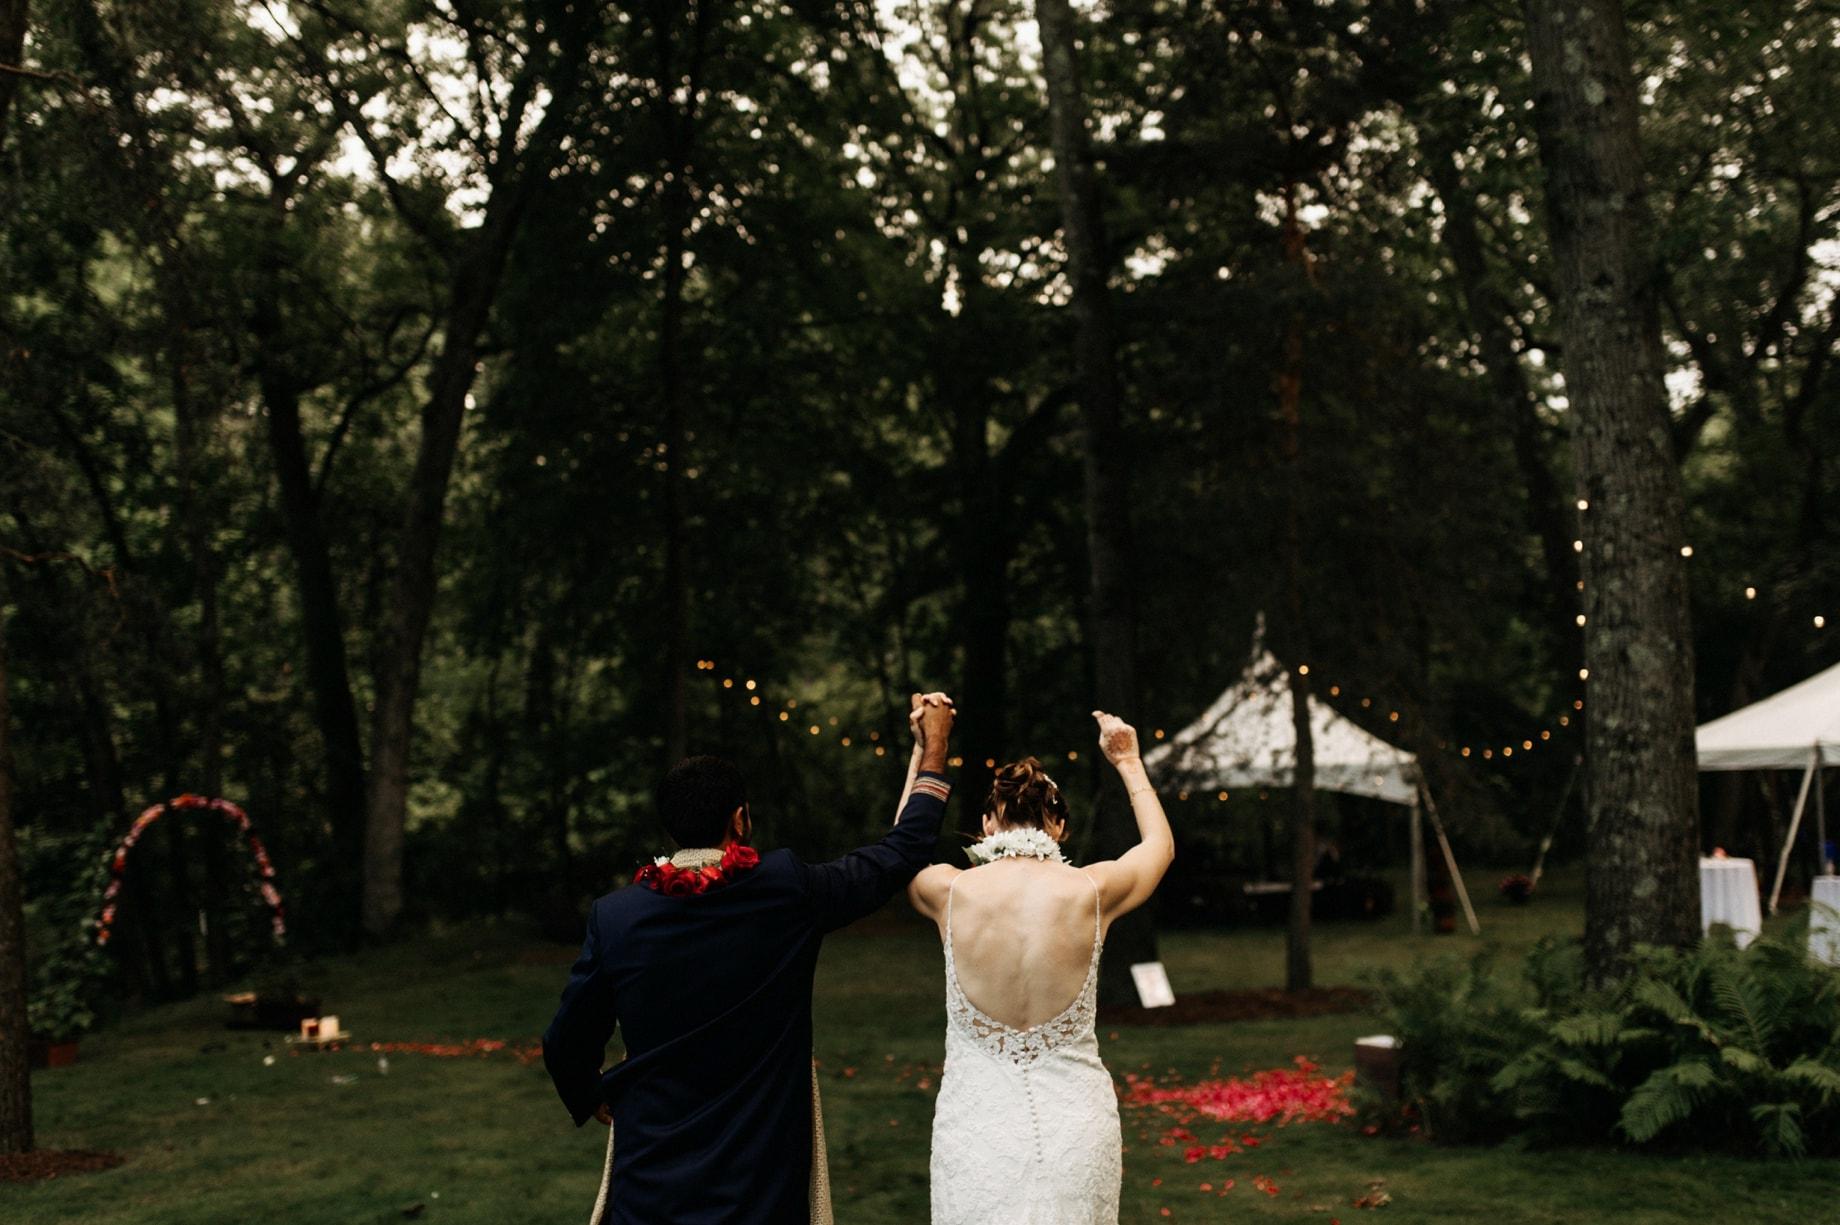 bride and groom entering their backyard wedding reception